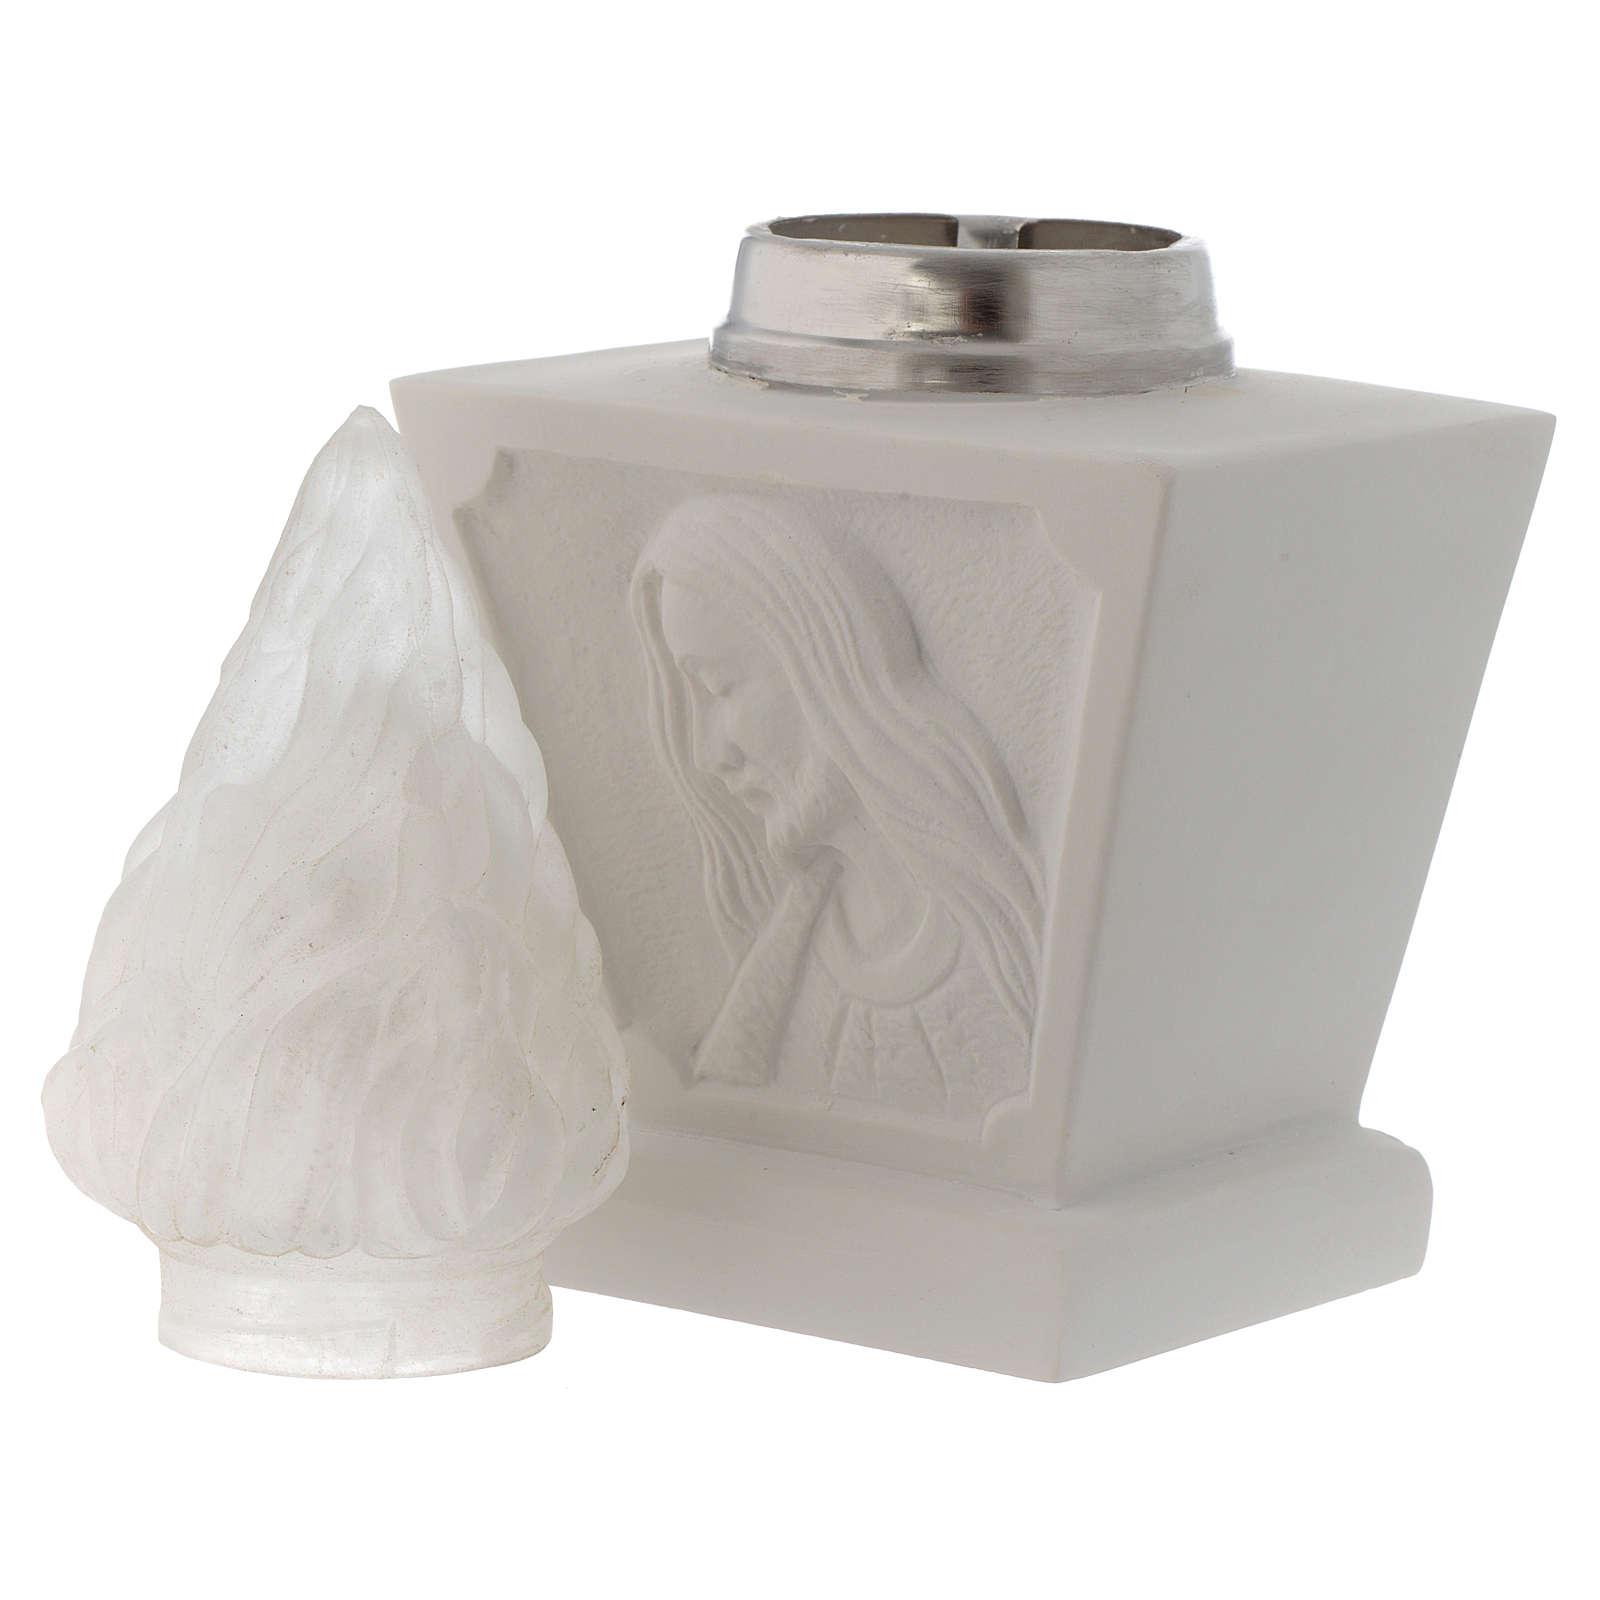 Portafiamma cimitero Gesù marmo sintetico bianco 3